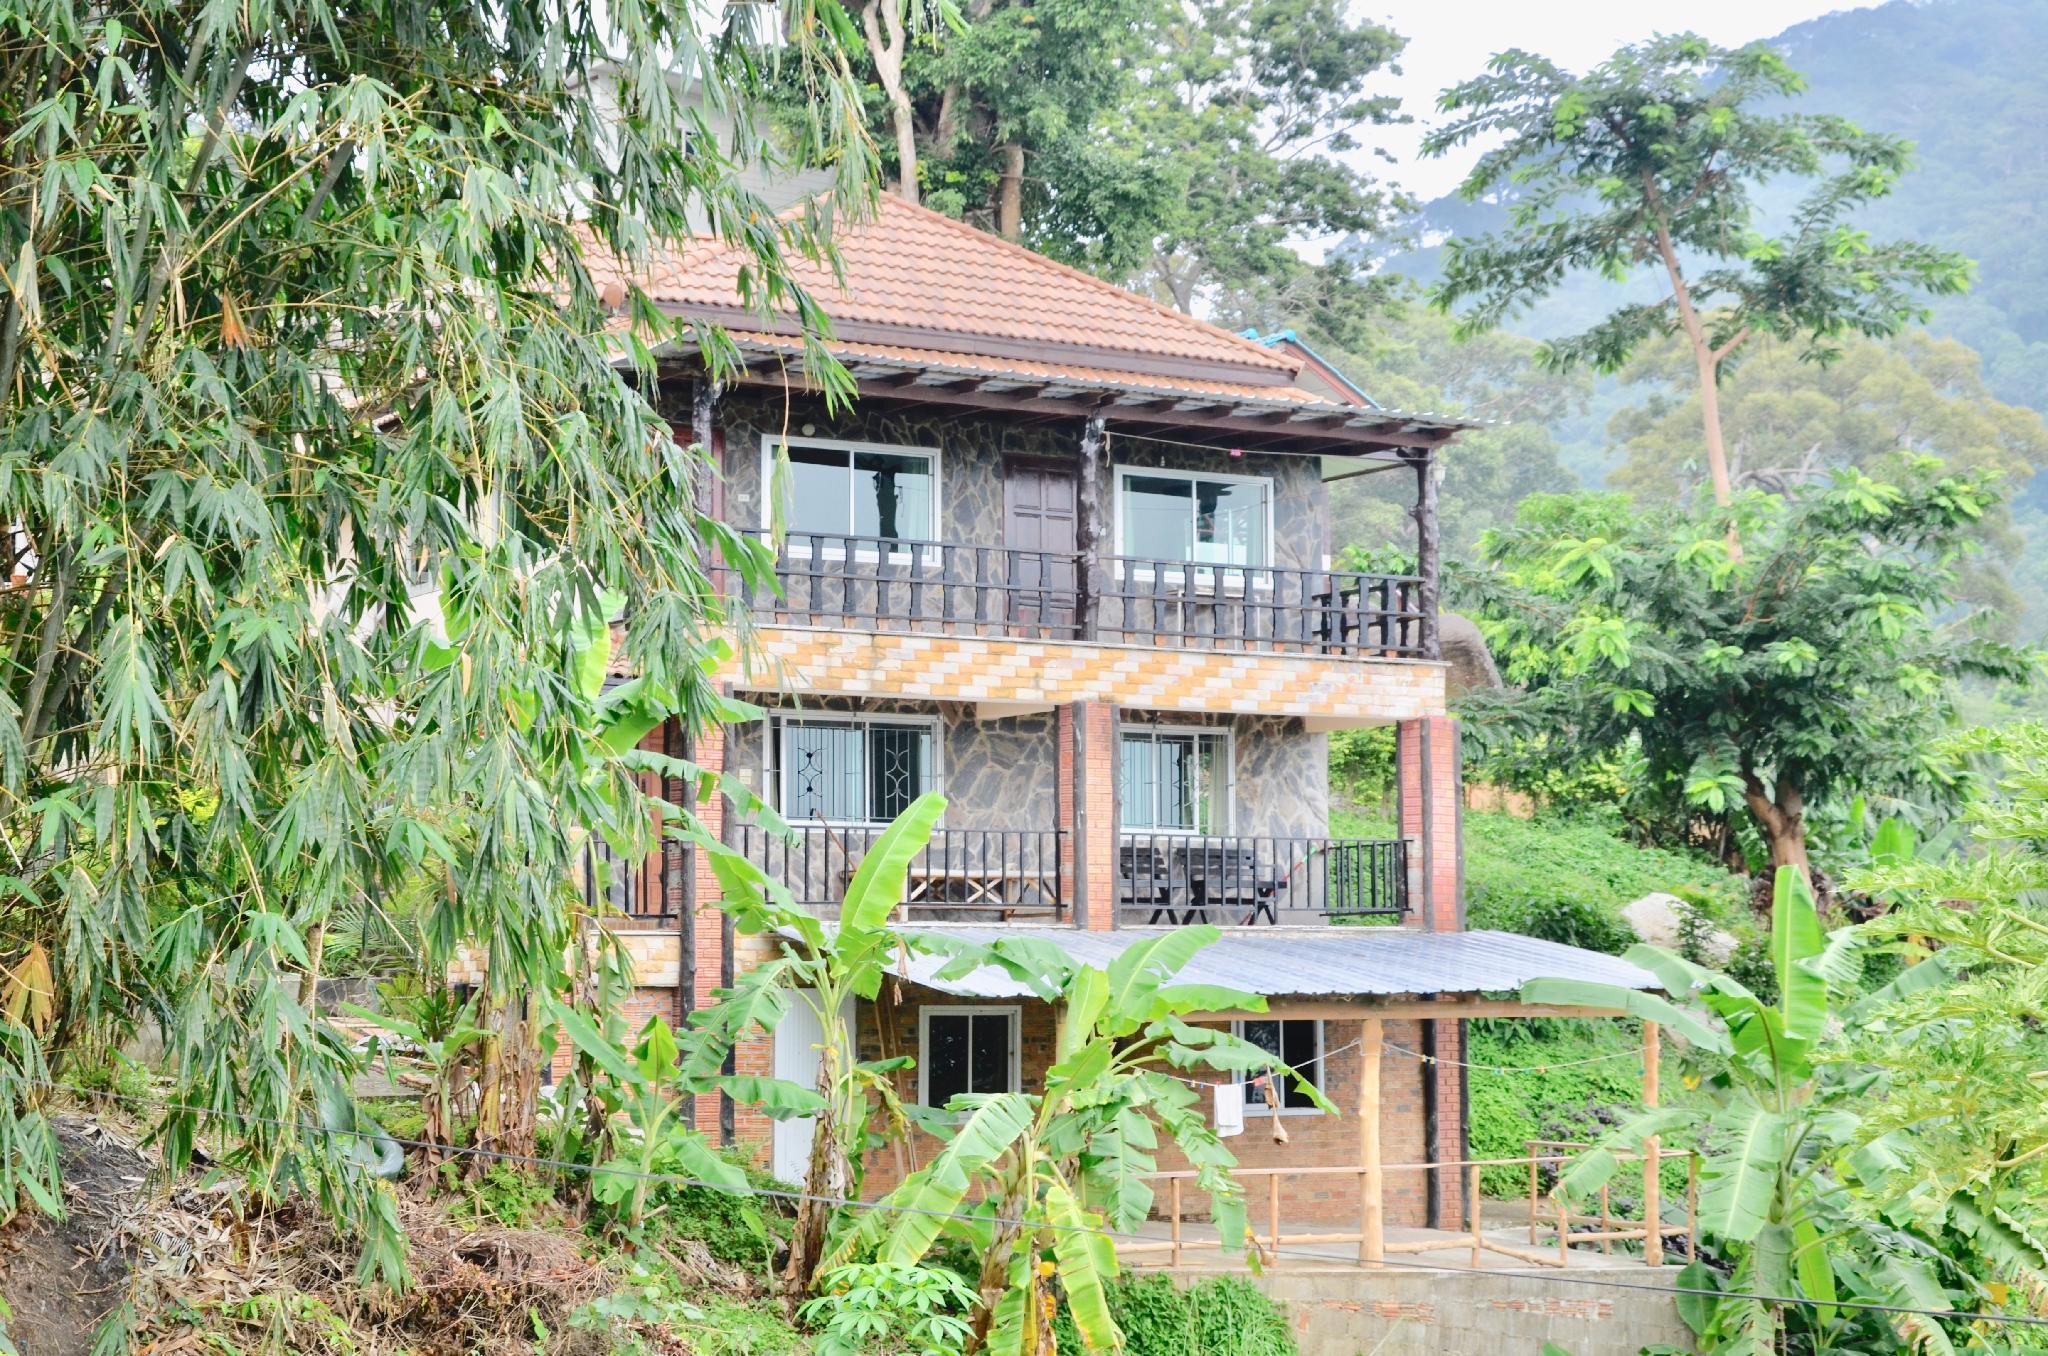 Phangan Party locate 3BDR View Point luxury Villa วิลลา 3 ห้องนอน 3 ห้องน้ำส่วนตัว ขนาด 200 ตร.ม. – บ้านมะเดื่อหวาน